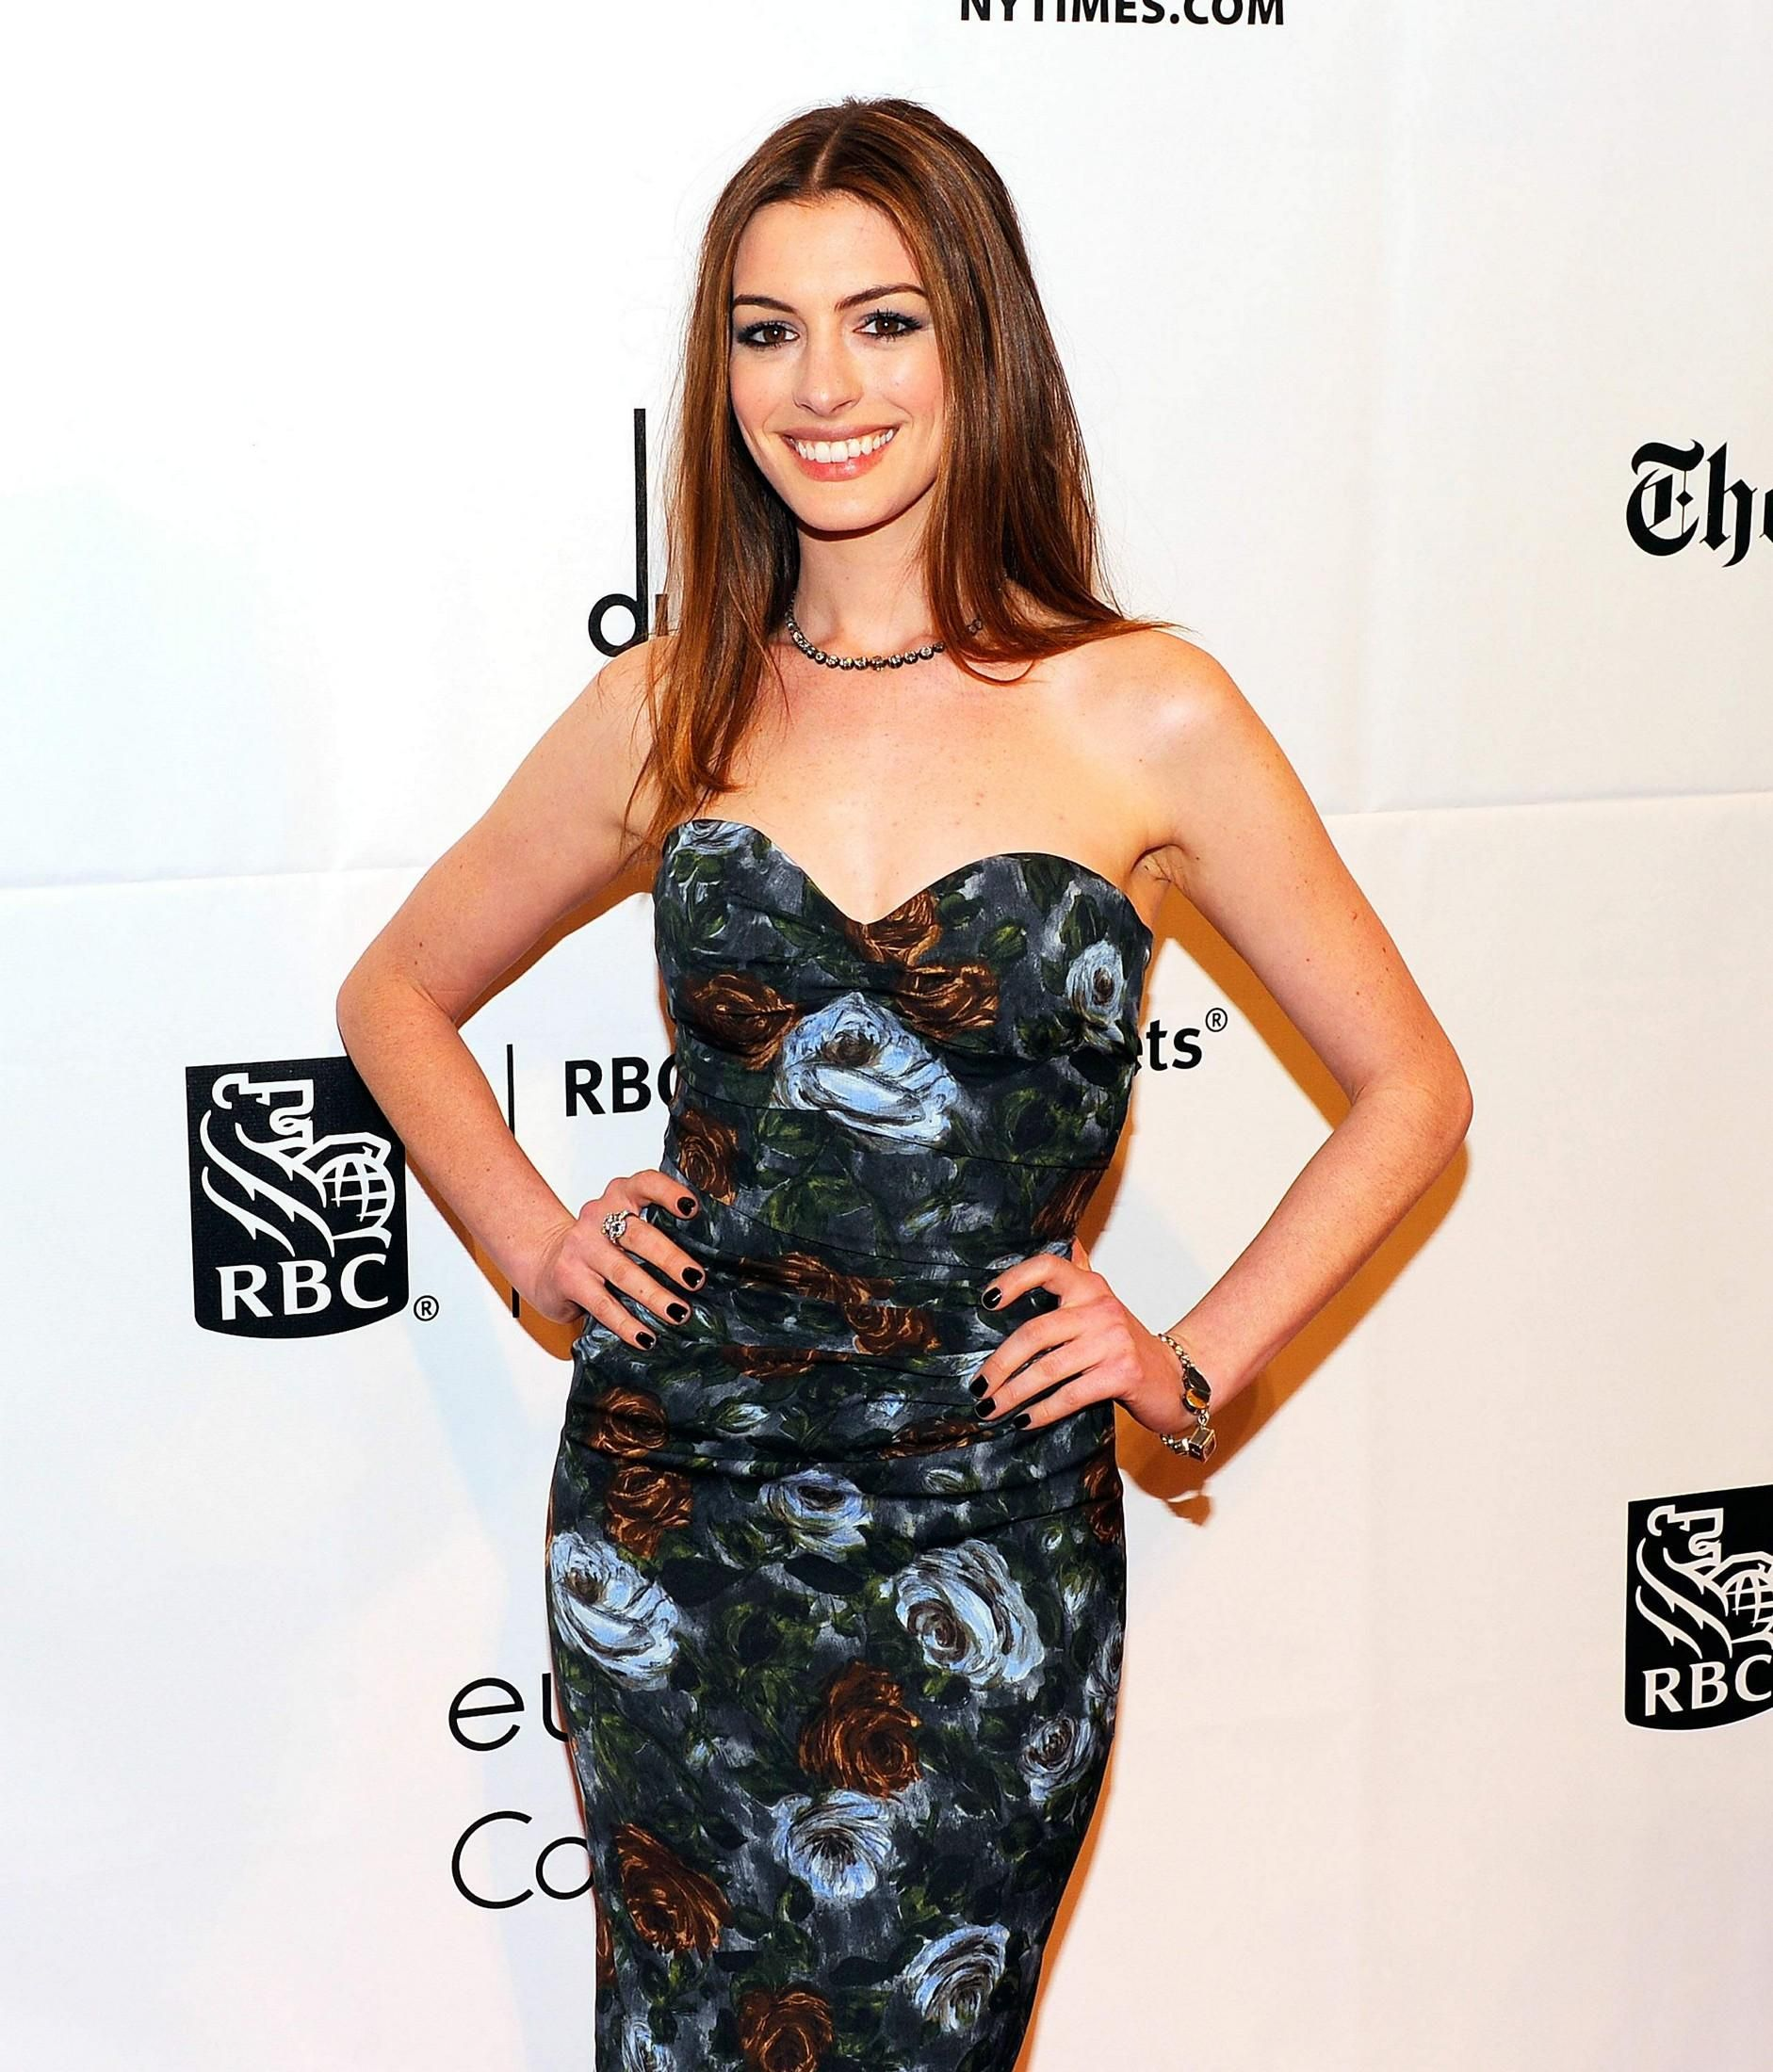 e4bf0802bc93 Anne Hathaway Film Awards, Hello Beautiful, Strapless Dress Formal, Formal  Dresses, Gotham